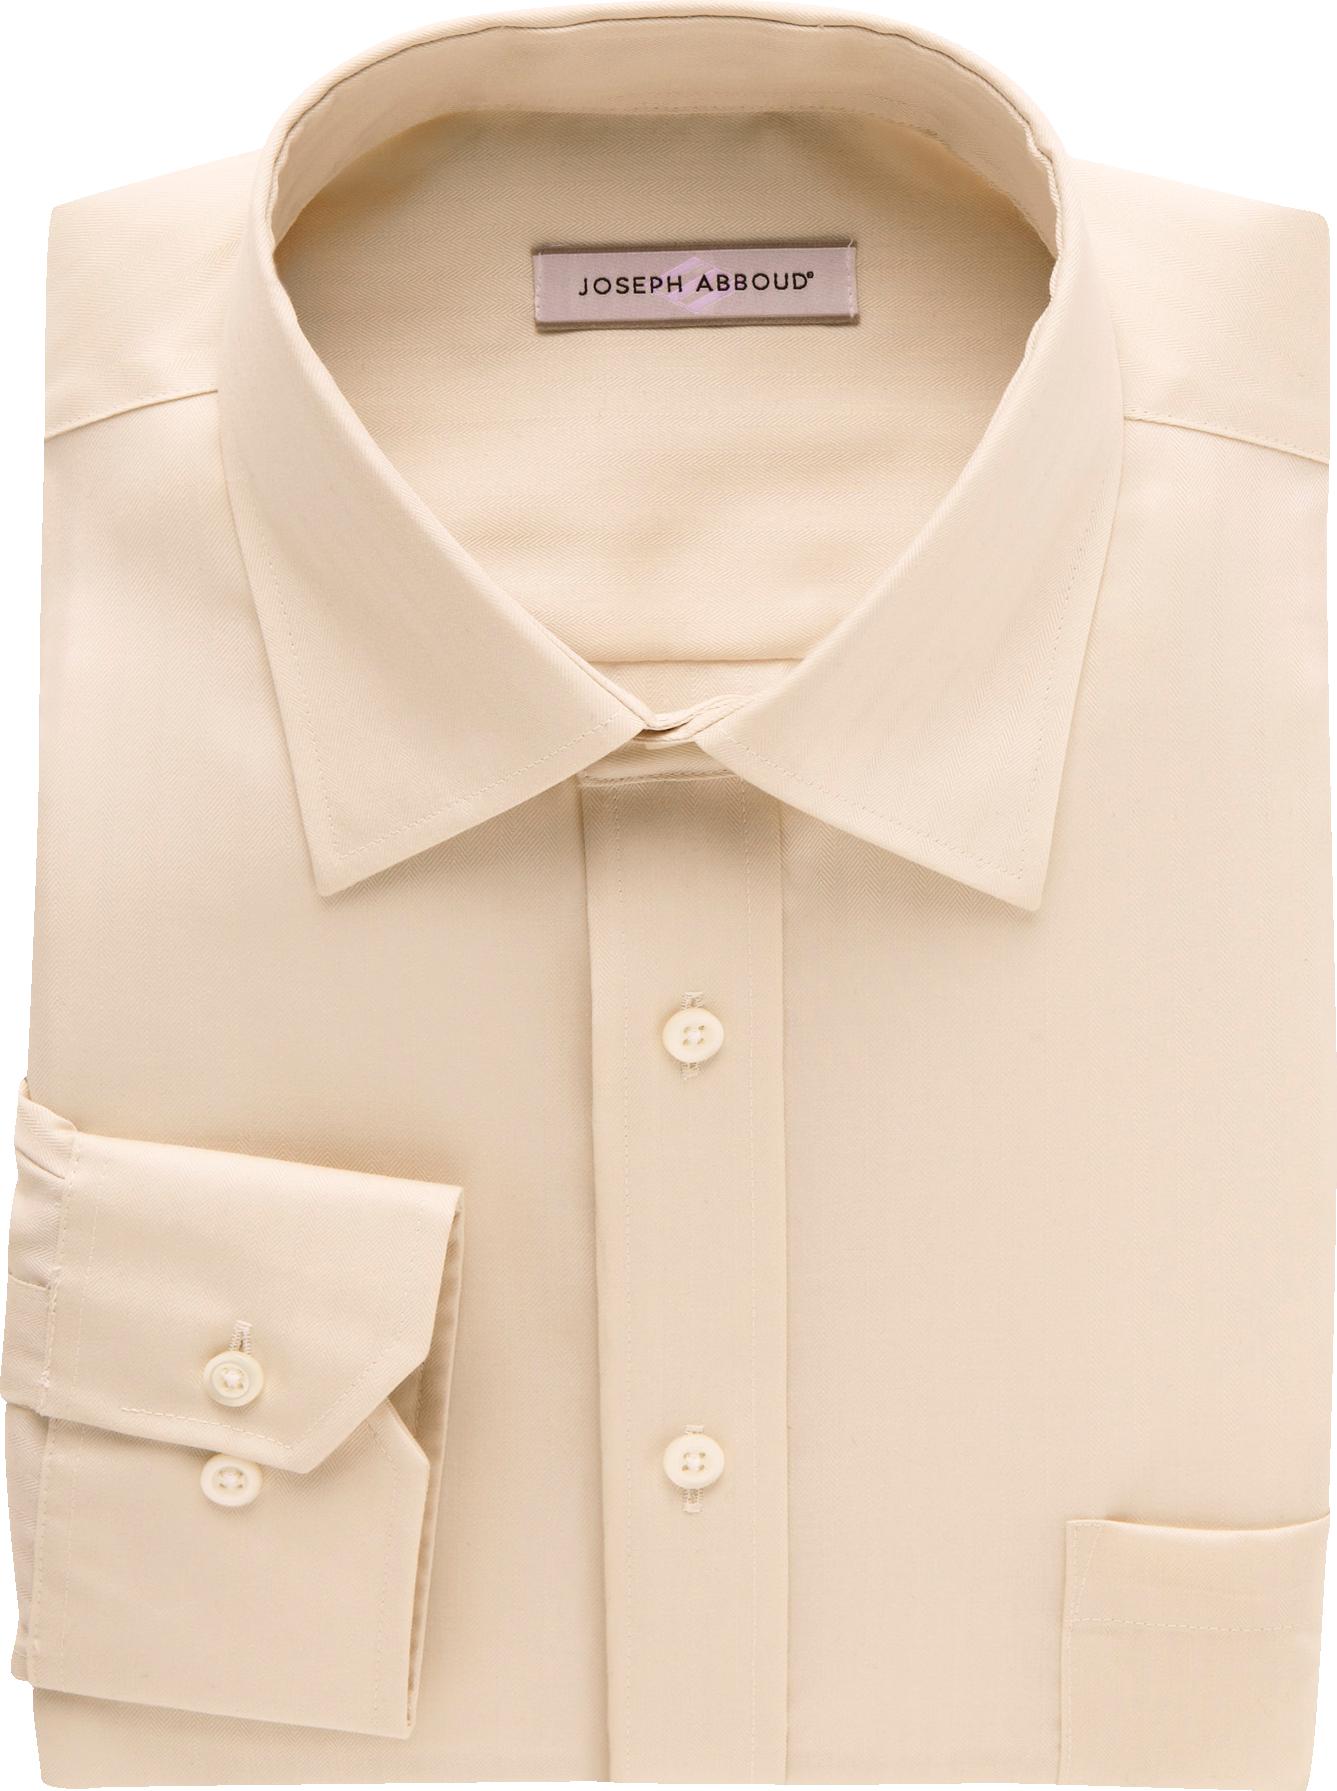 Mens dress shirts images